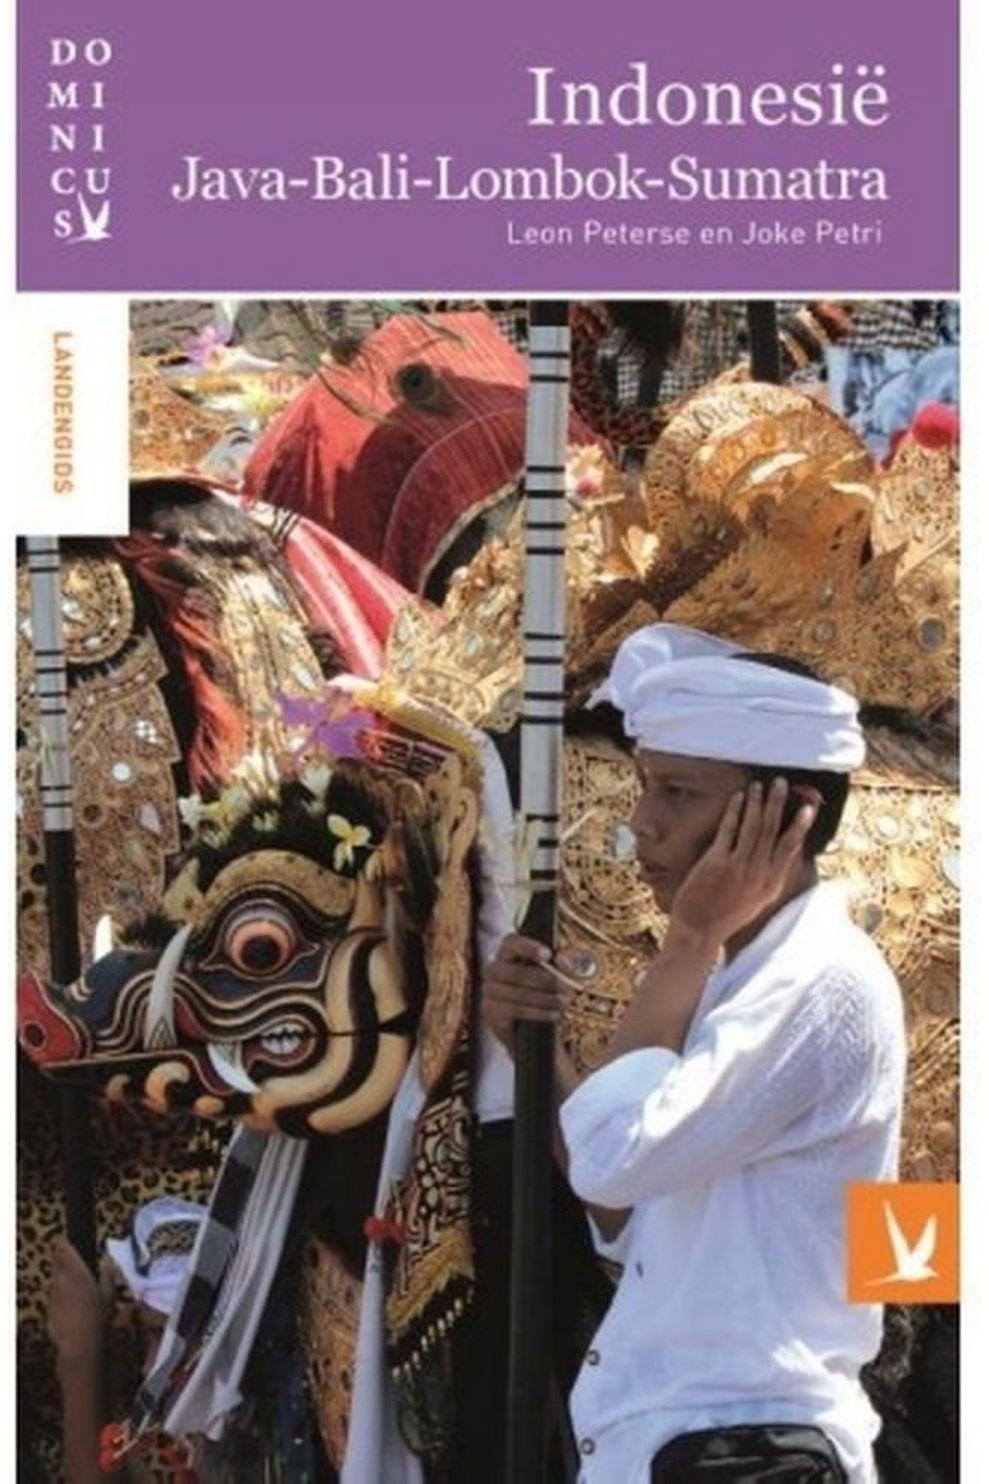 Dominicus Indonesië-Dom-Reisgids-Java-Bali-Lombok-Sumatran06/2017 - 2019